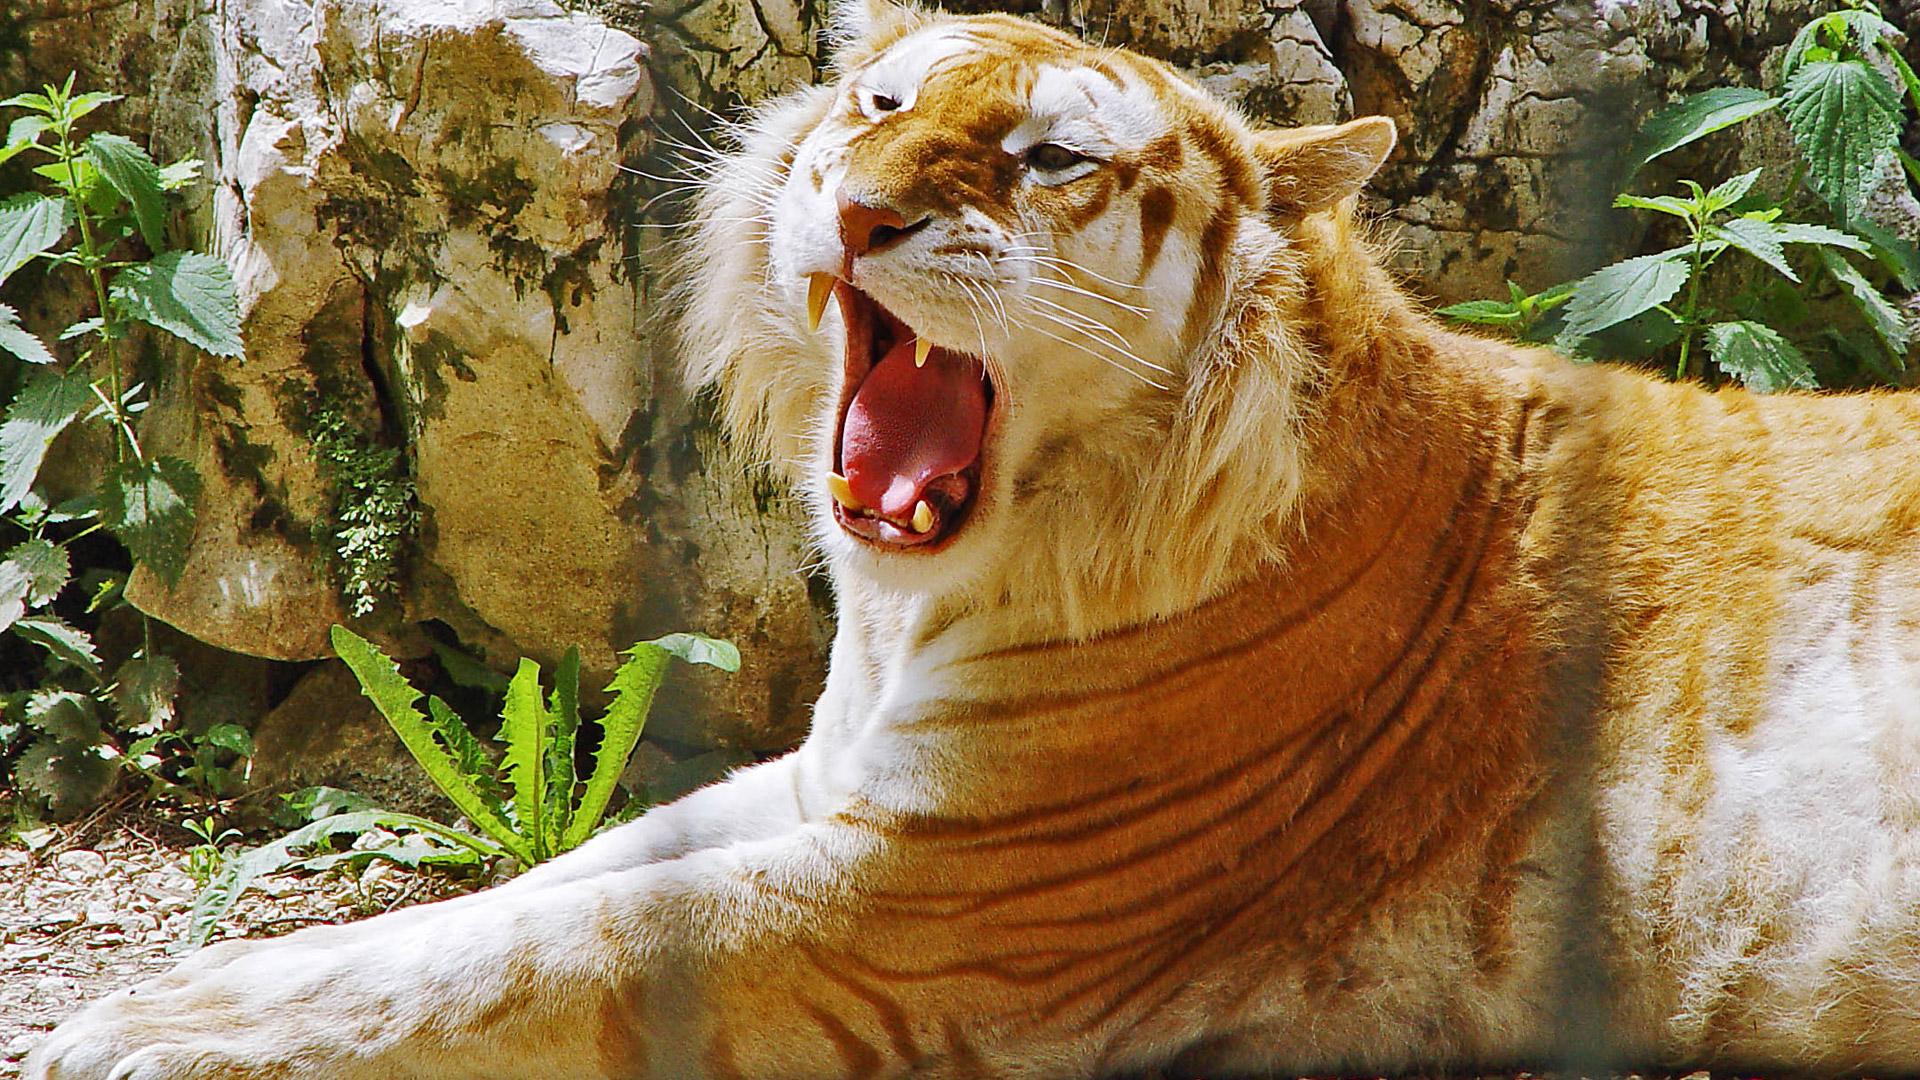 HD Wallpapers Golden Tiger HDTV 1080p